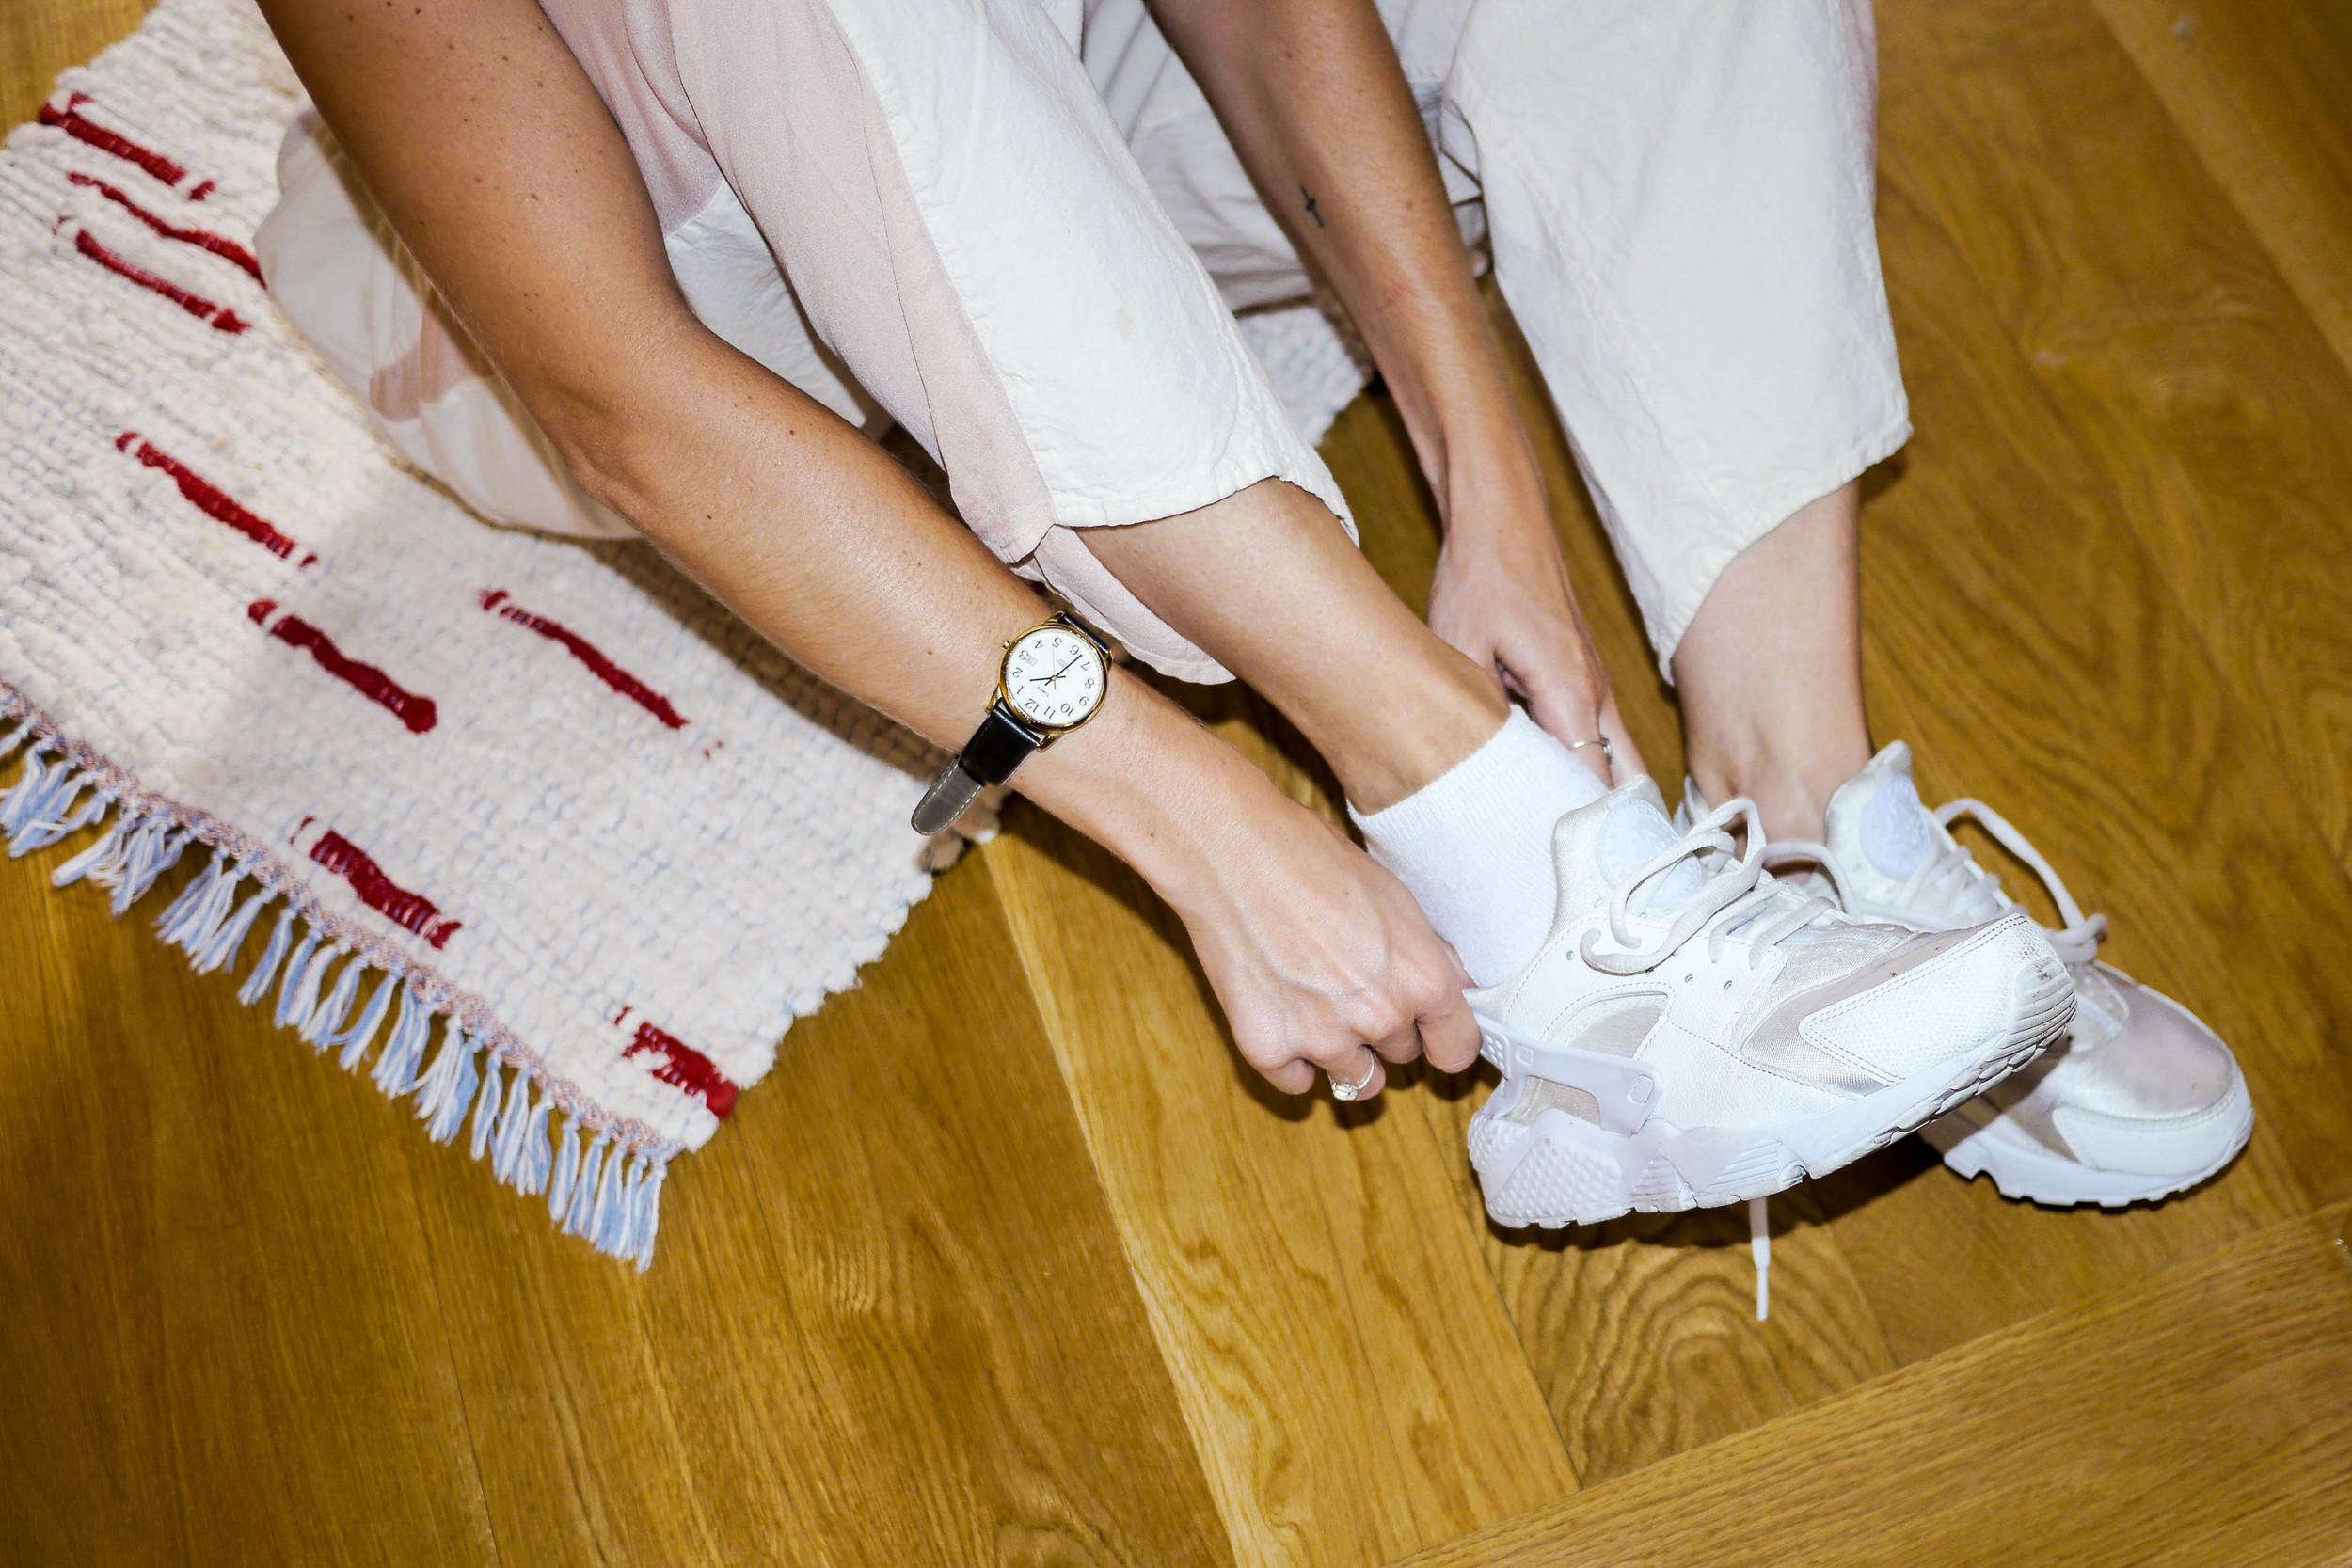 Pants, Datura ;    Shoes, Nike    ;    Watch, Timex